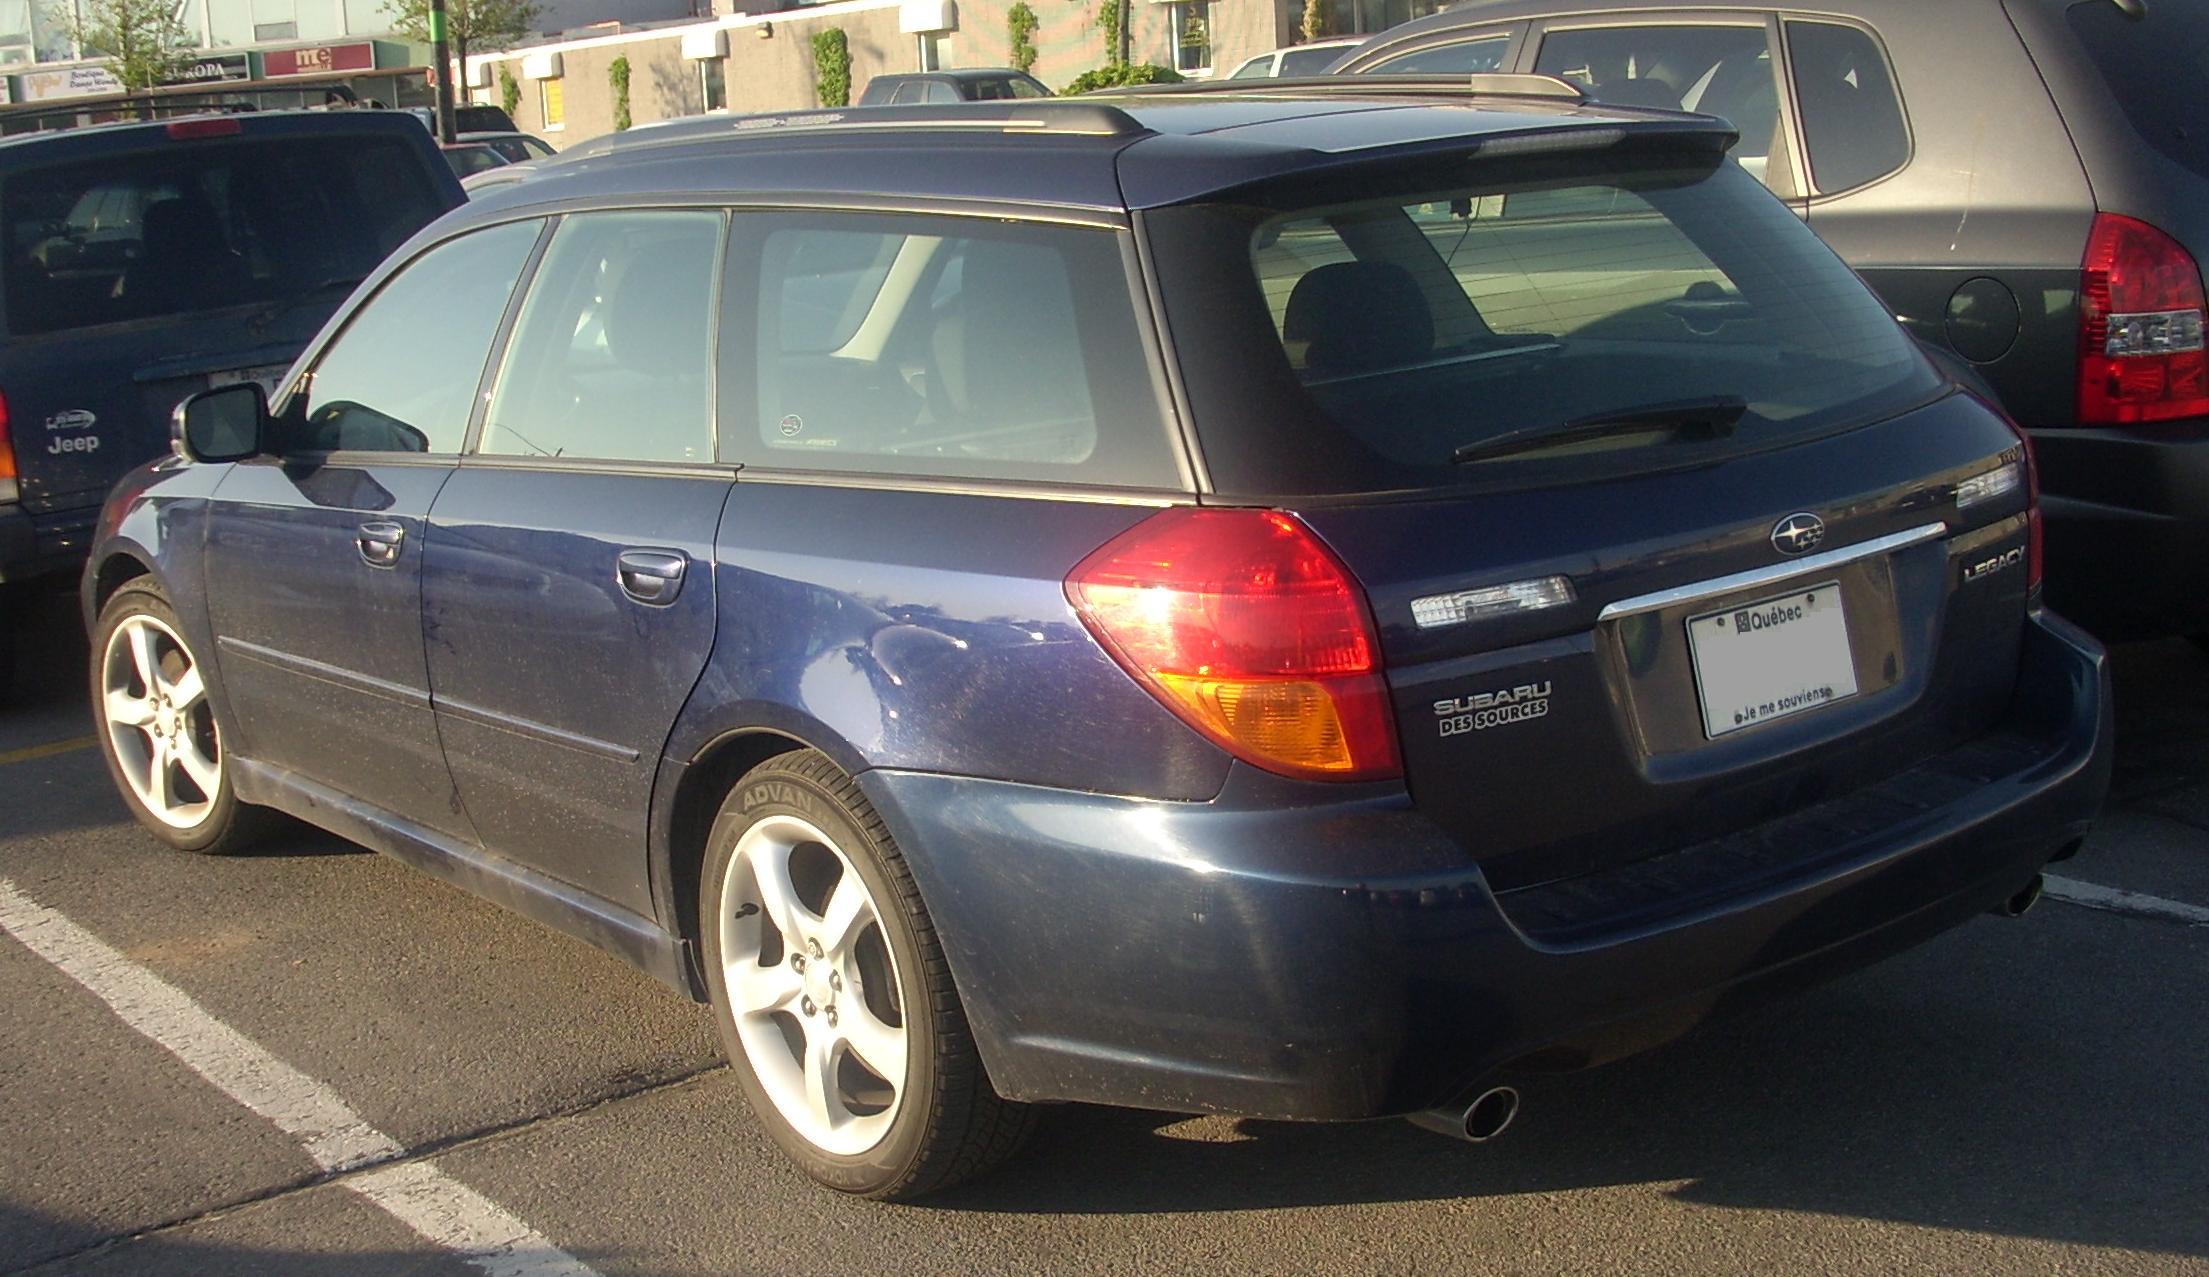 Subaru Des Sources >> File 05 07 Subaru Legacy Wagon Jpg Wikimedia Commons